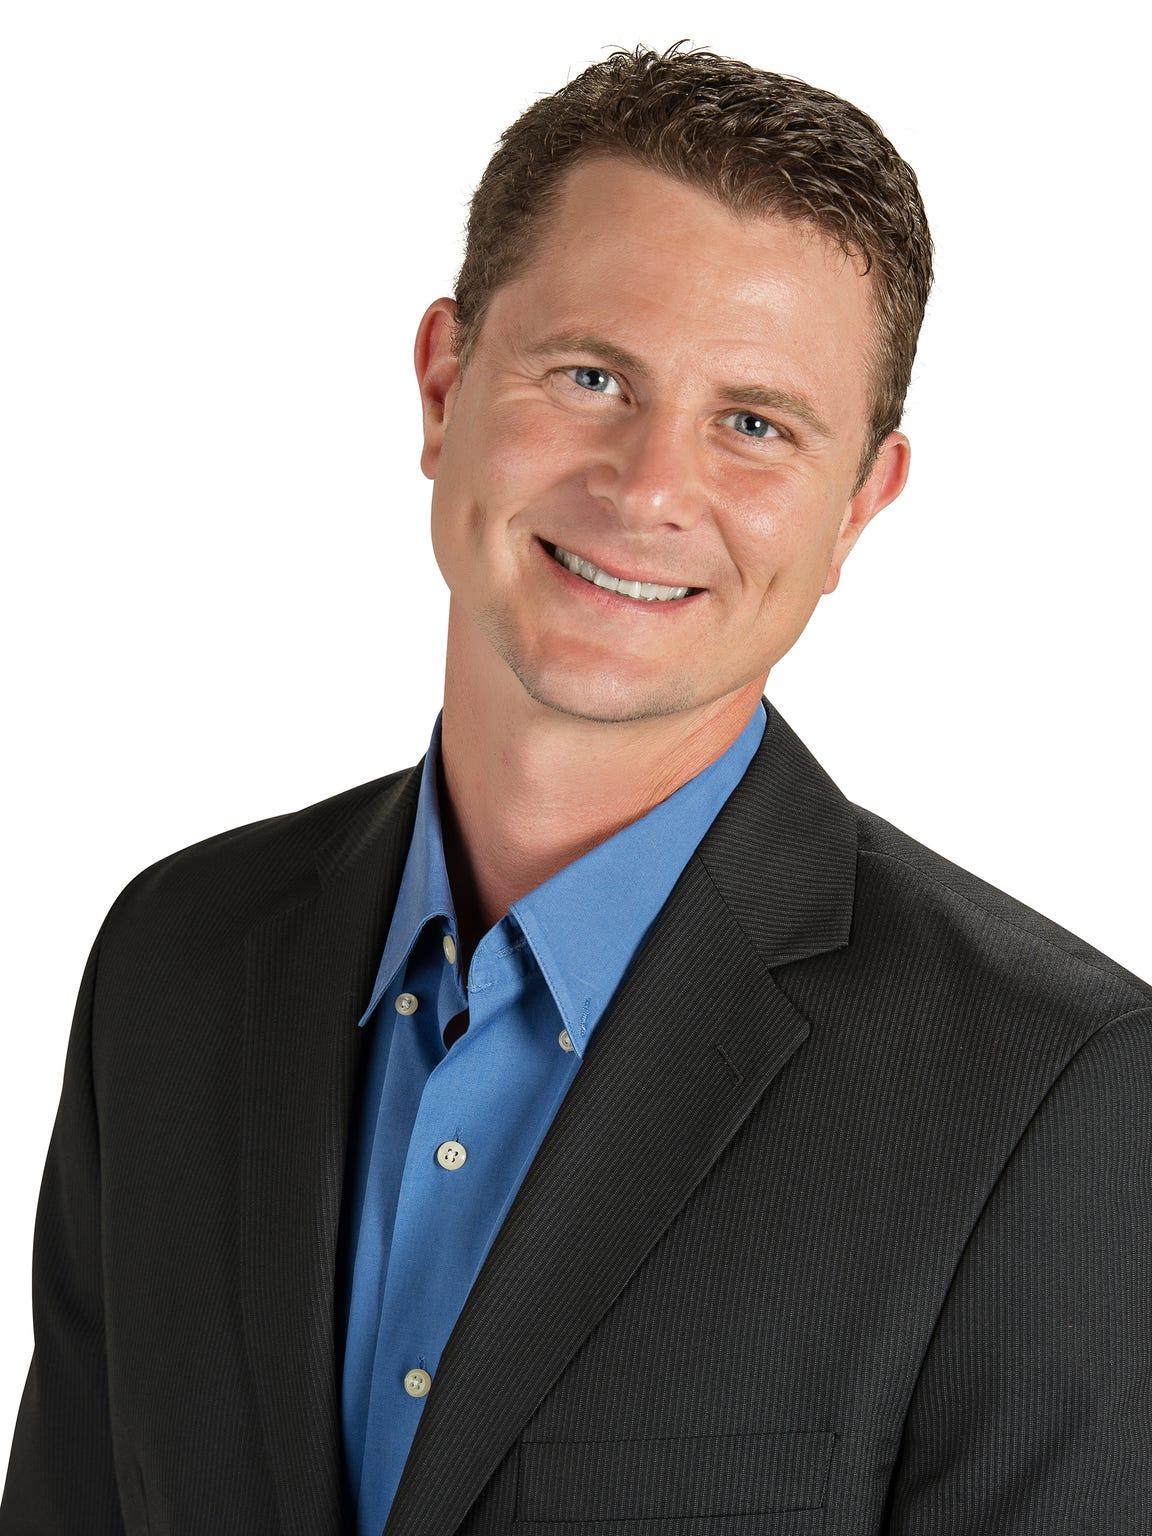 Ryan Shortill, CEO of San Diego-based Positive Adventures,